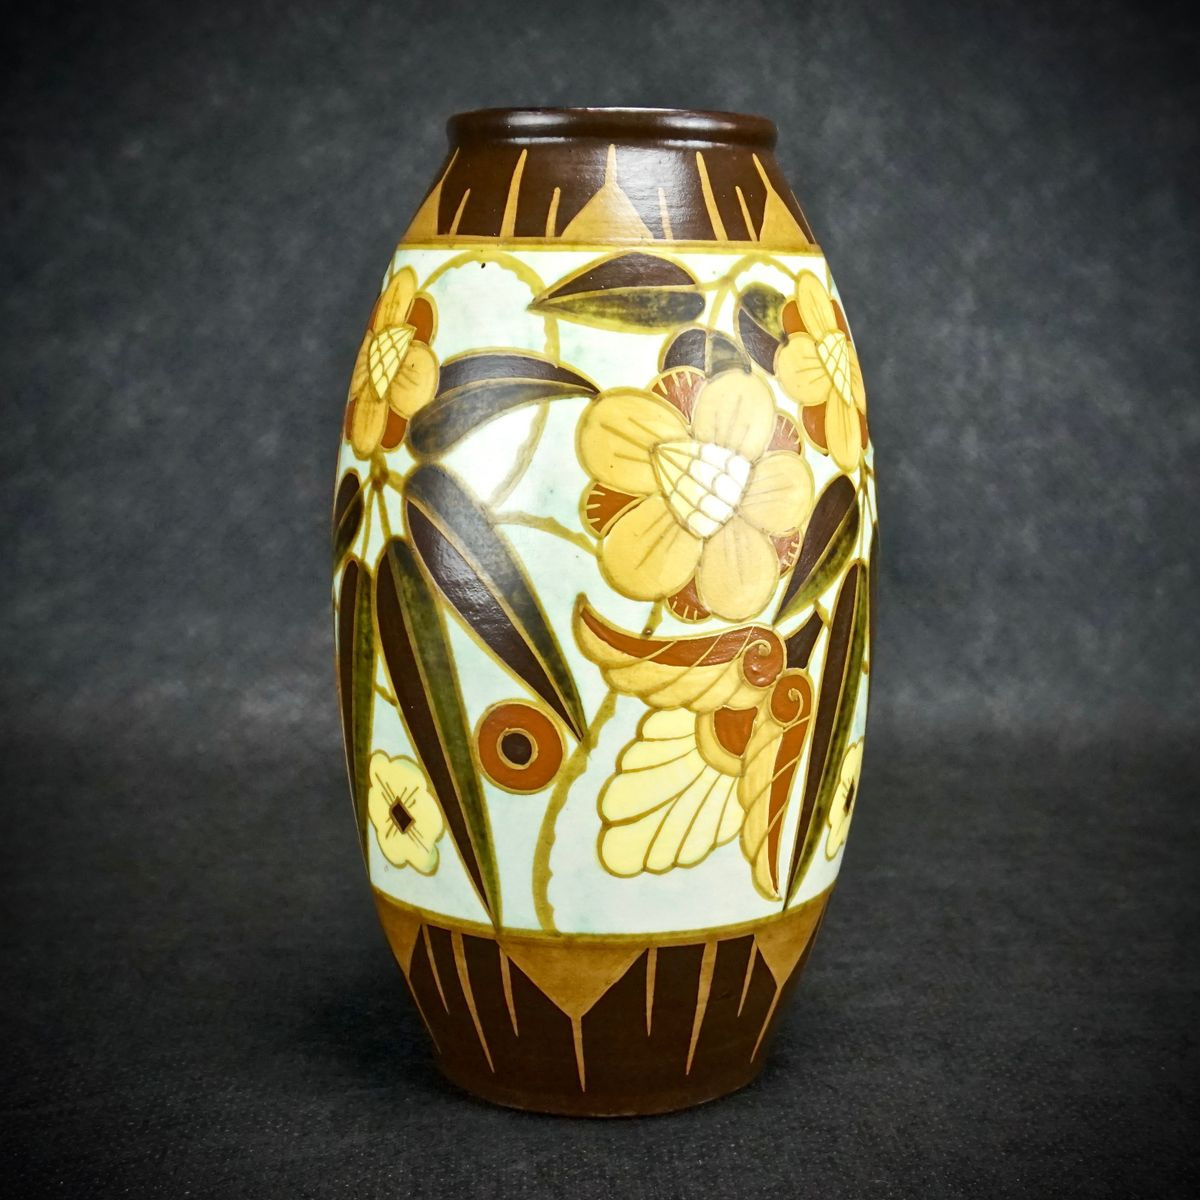 art deco vase by charles catteau for boch freres 1934 for. Black Bedroom Furniture Sets. Home Design Ideas